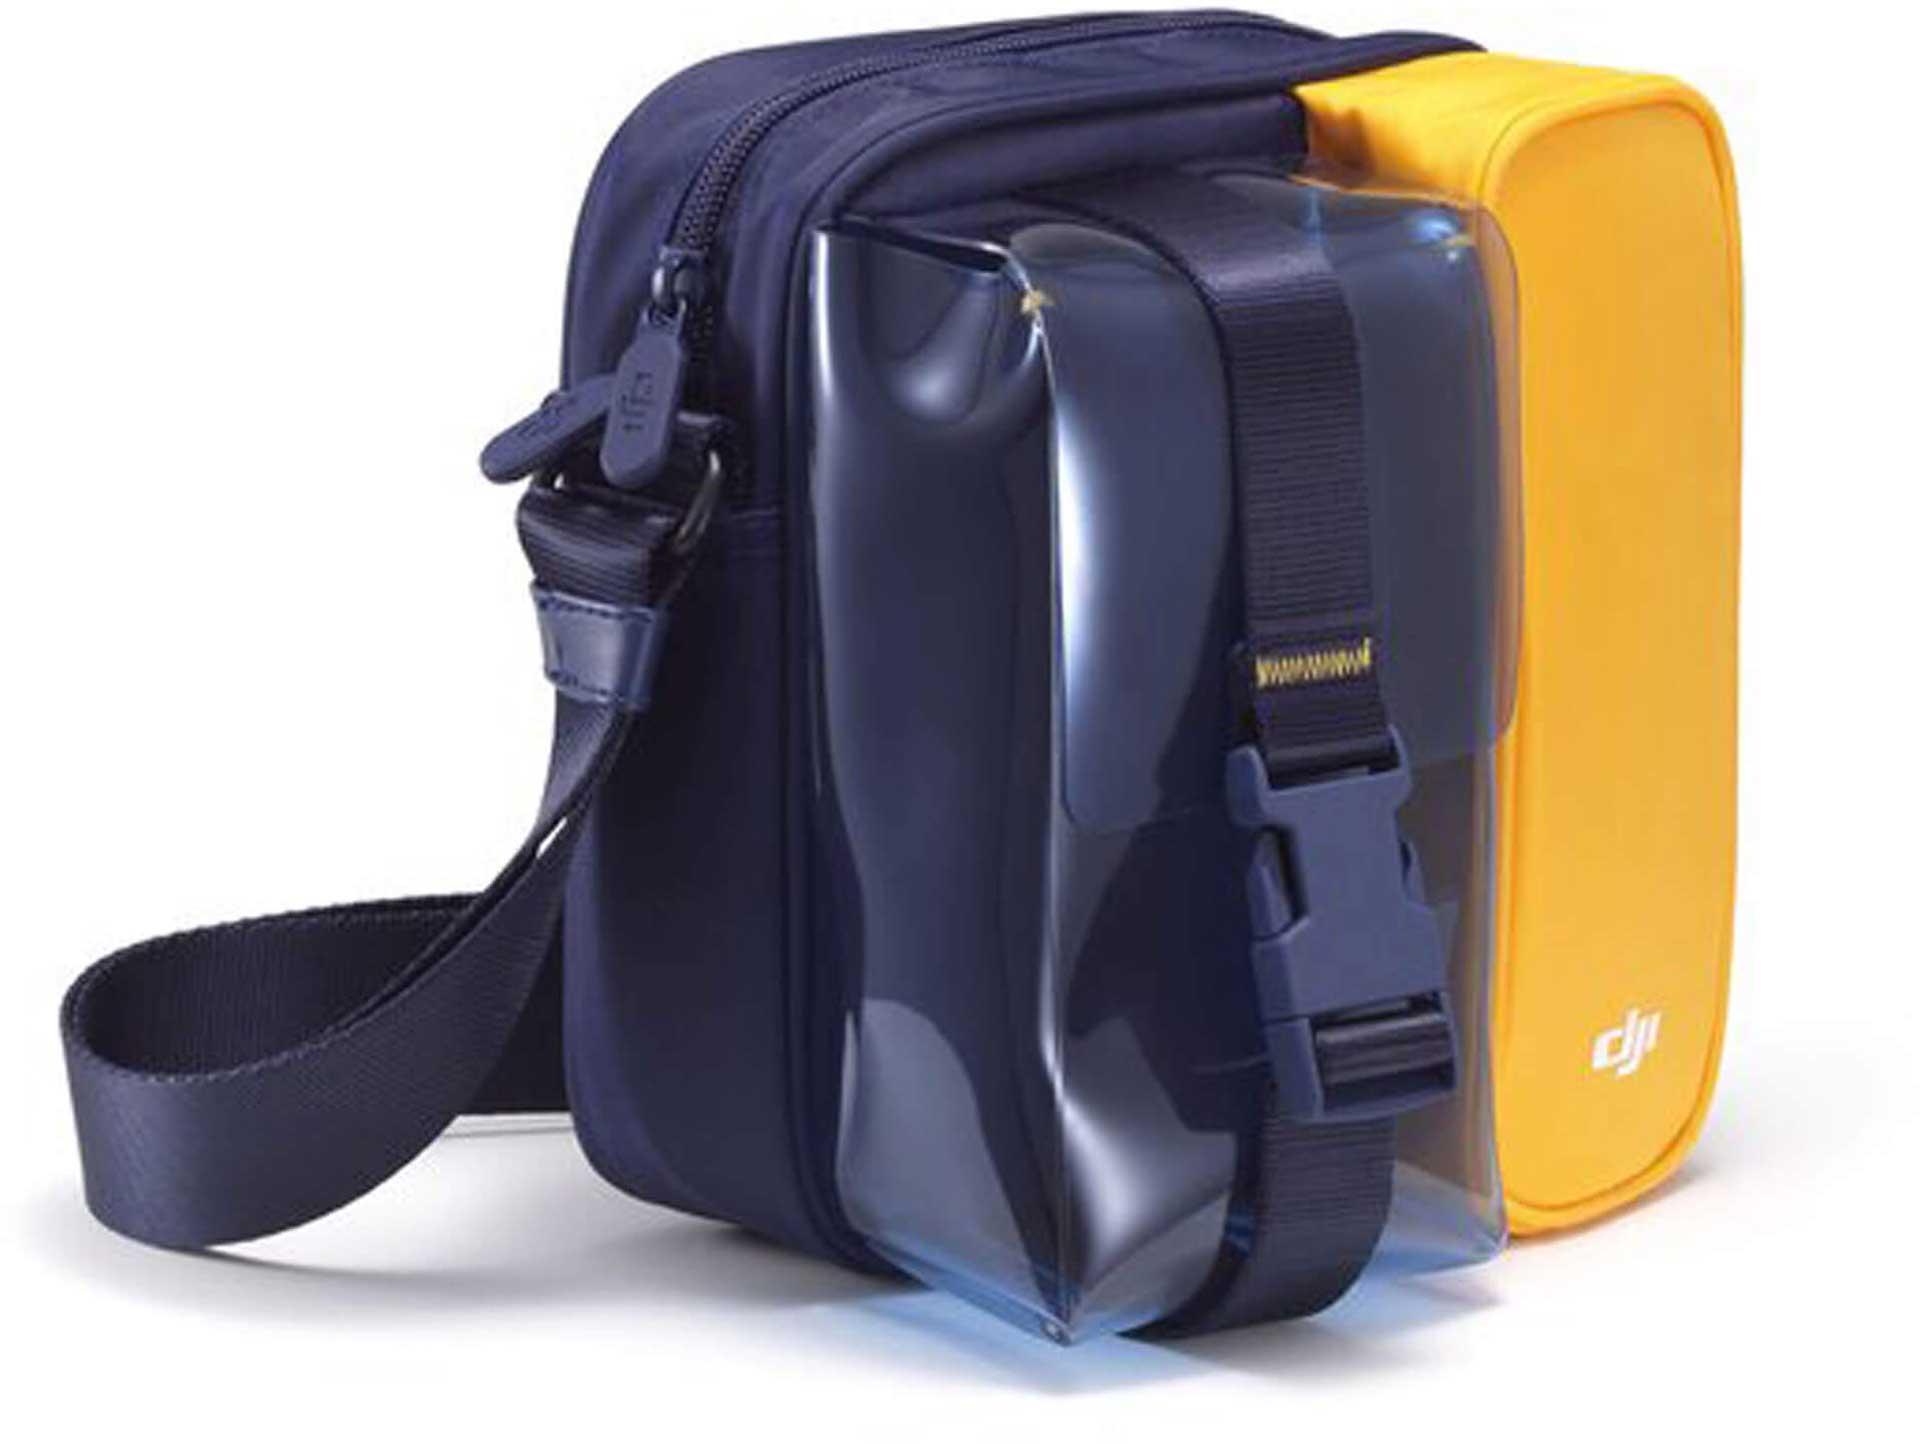 DJI Mini Umhängetasche (Blau+Gelb)